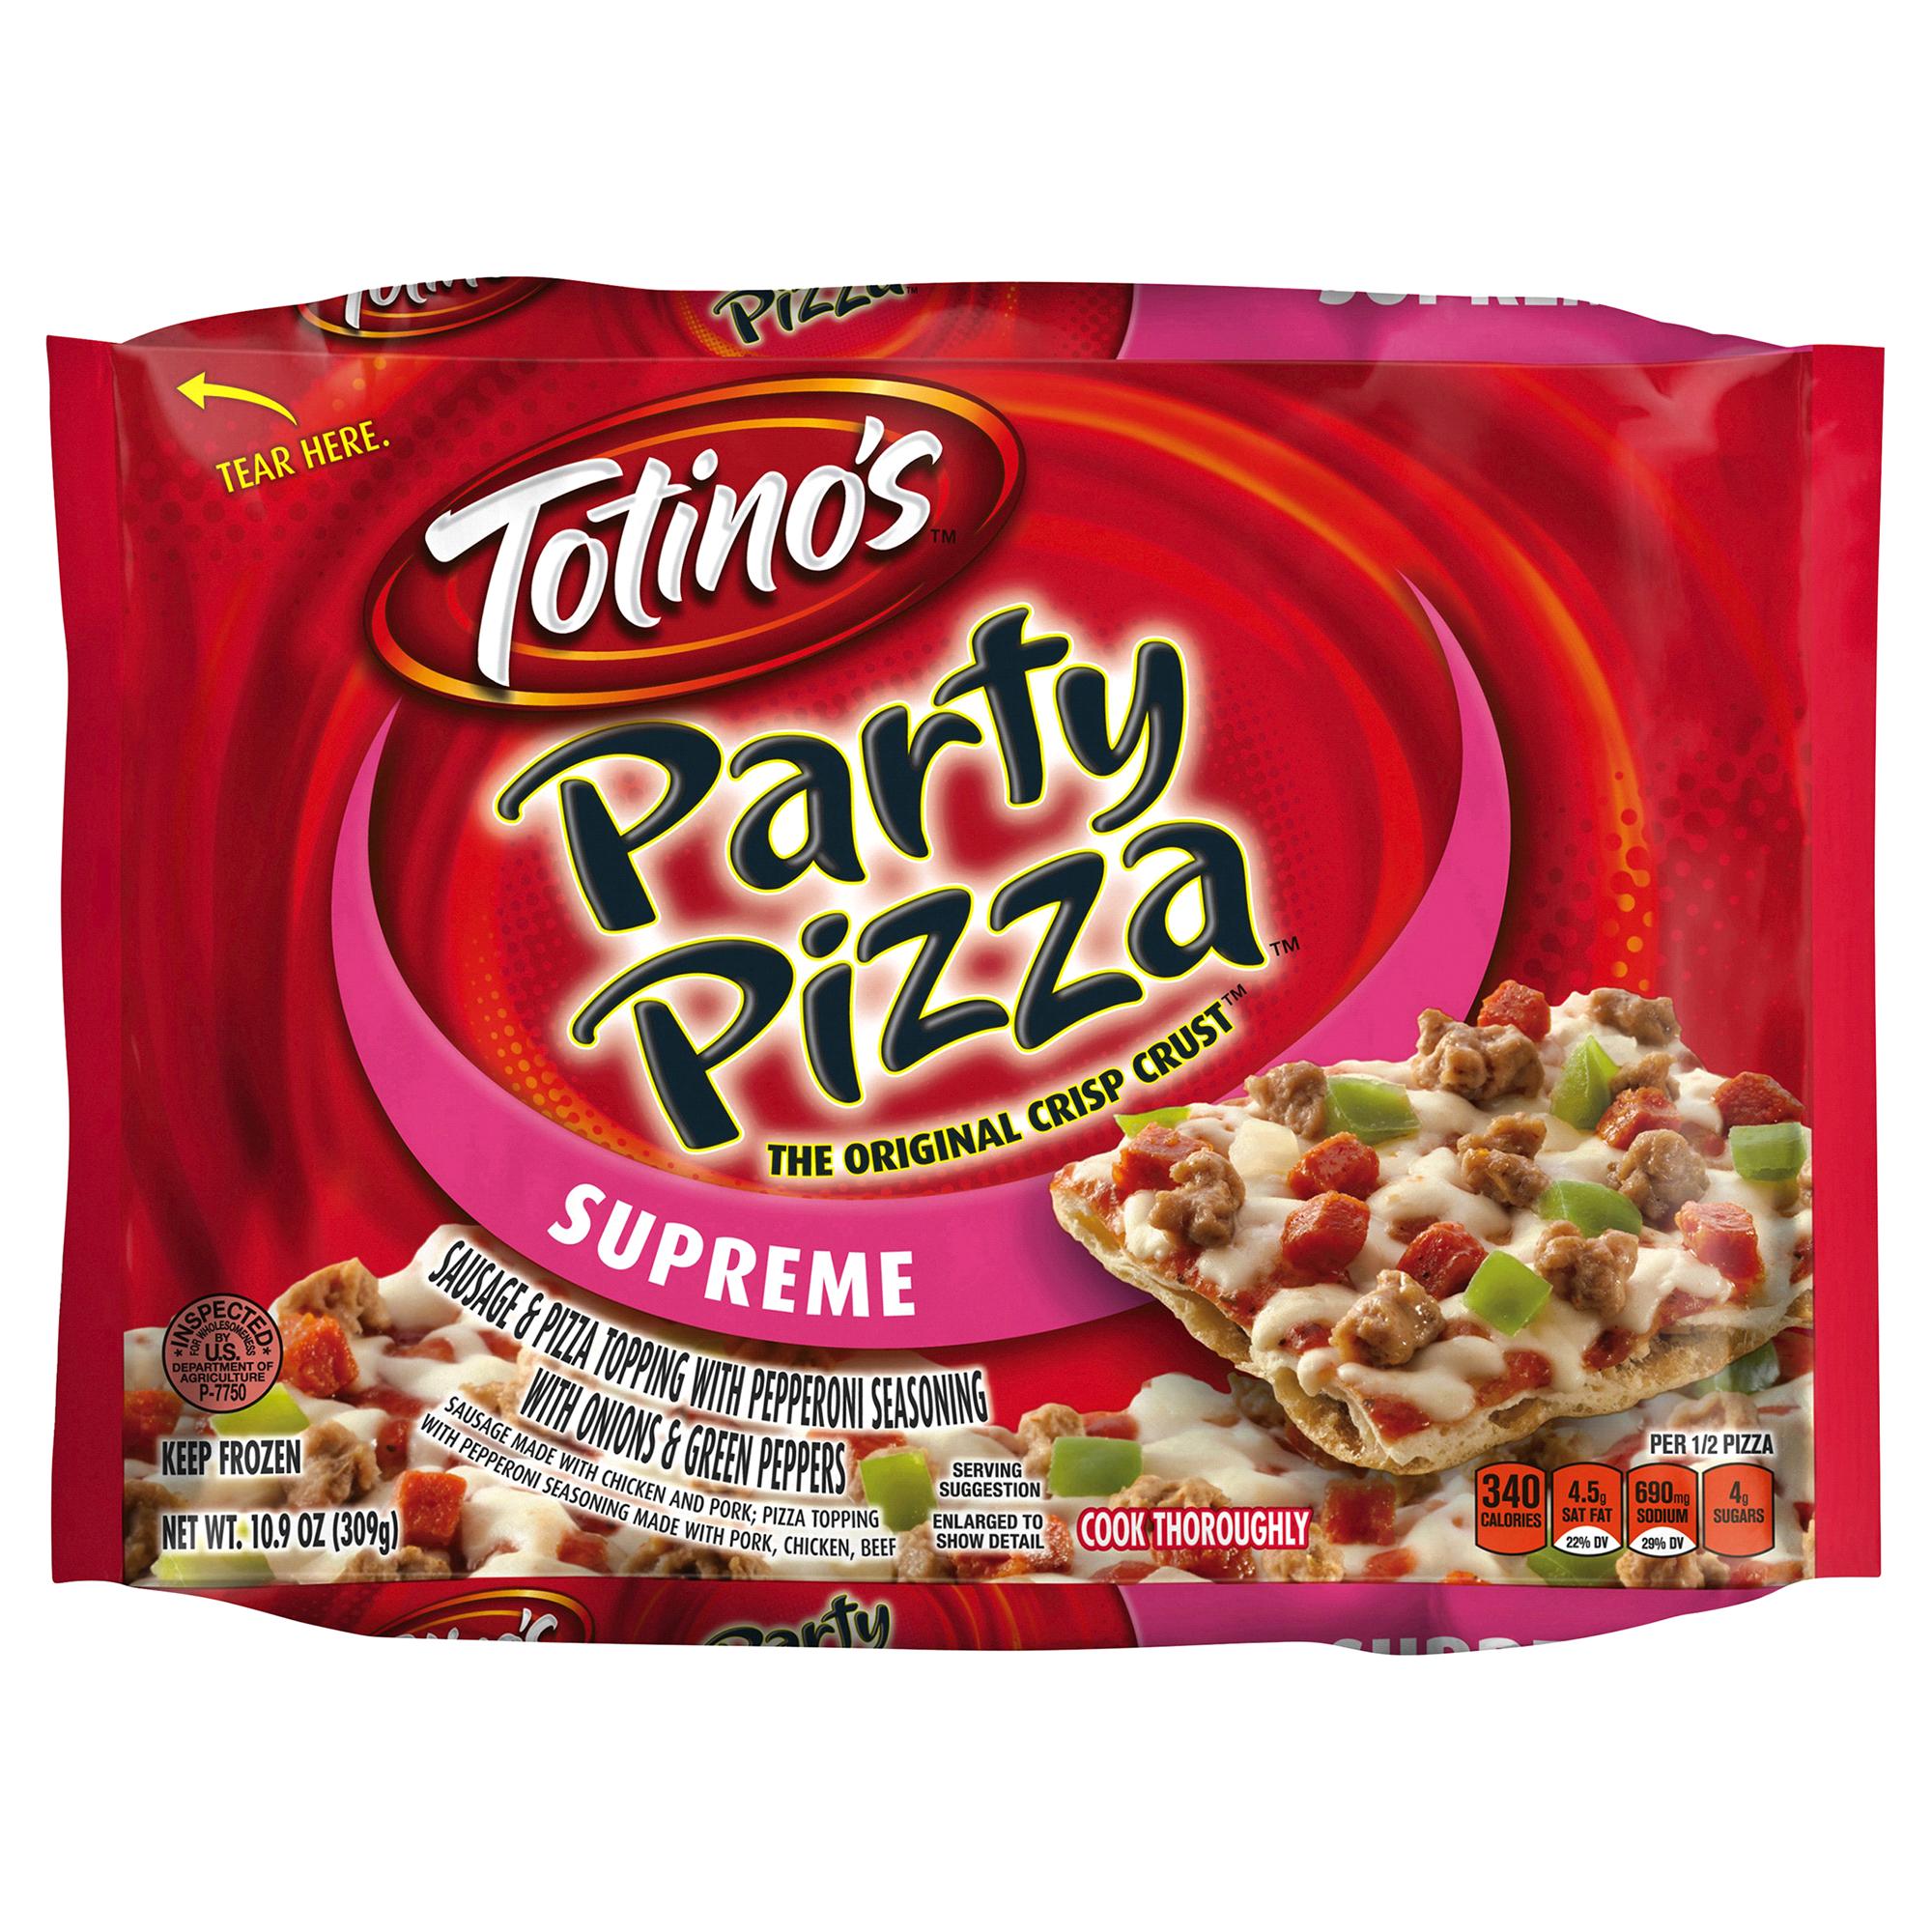 totinos supreme party pizza 10.9 oz box | meijer